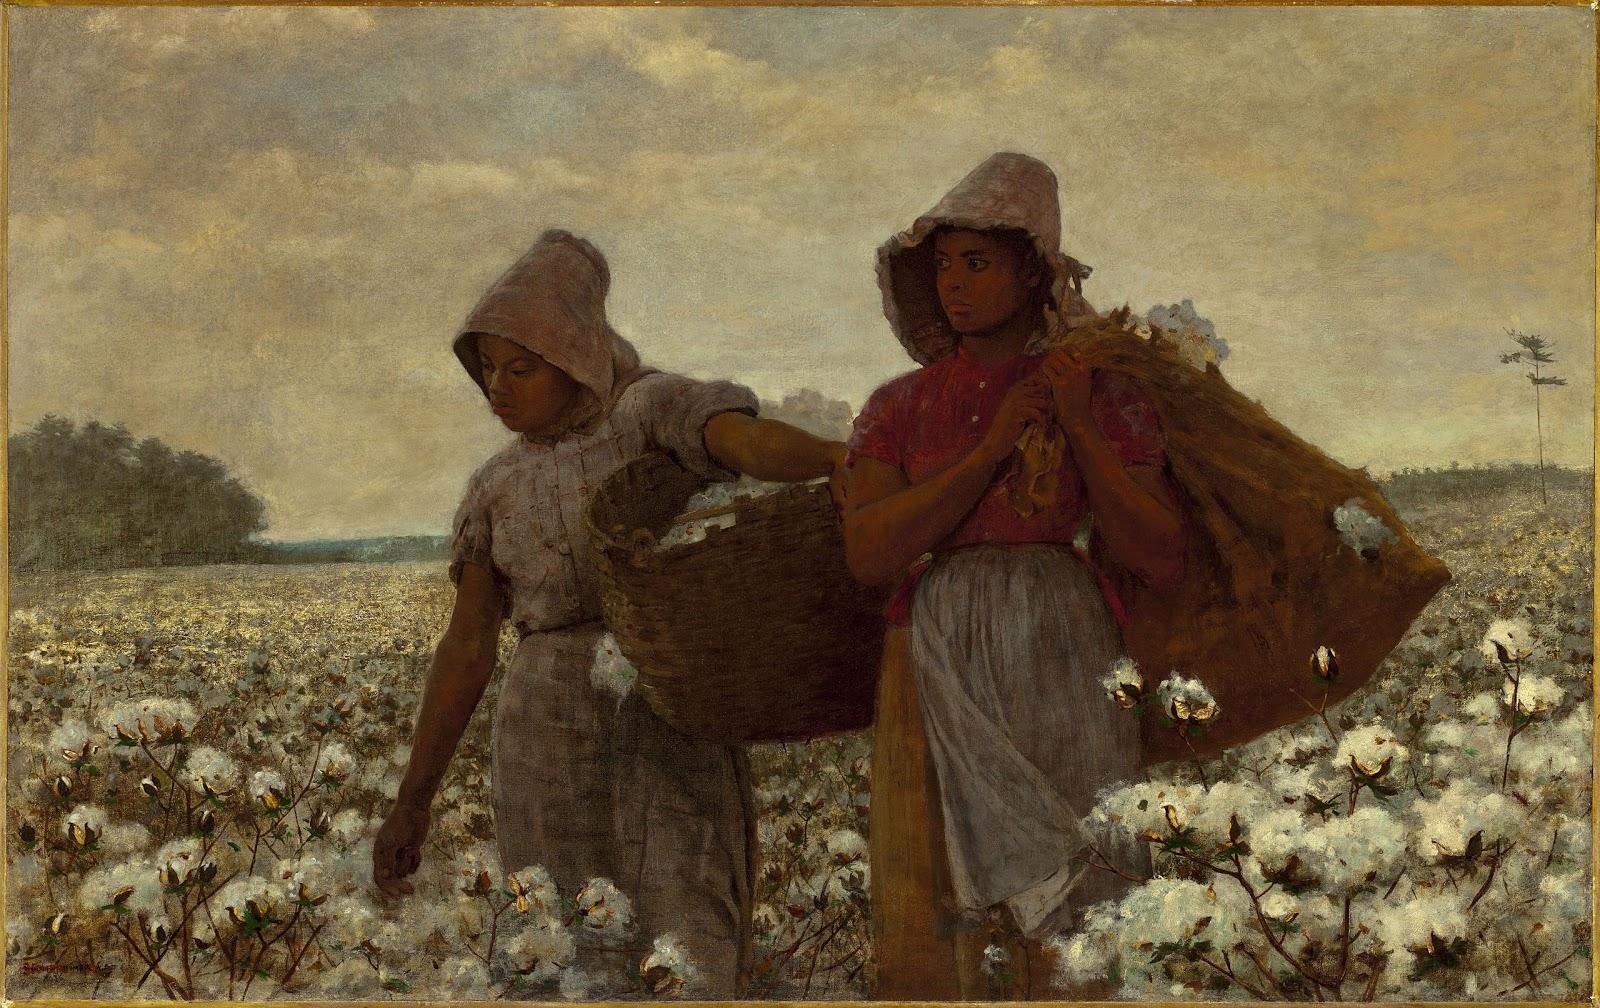 Winslow_Homer_-_The_Cotton_Pickers_-_Google_Art_Project.jpg